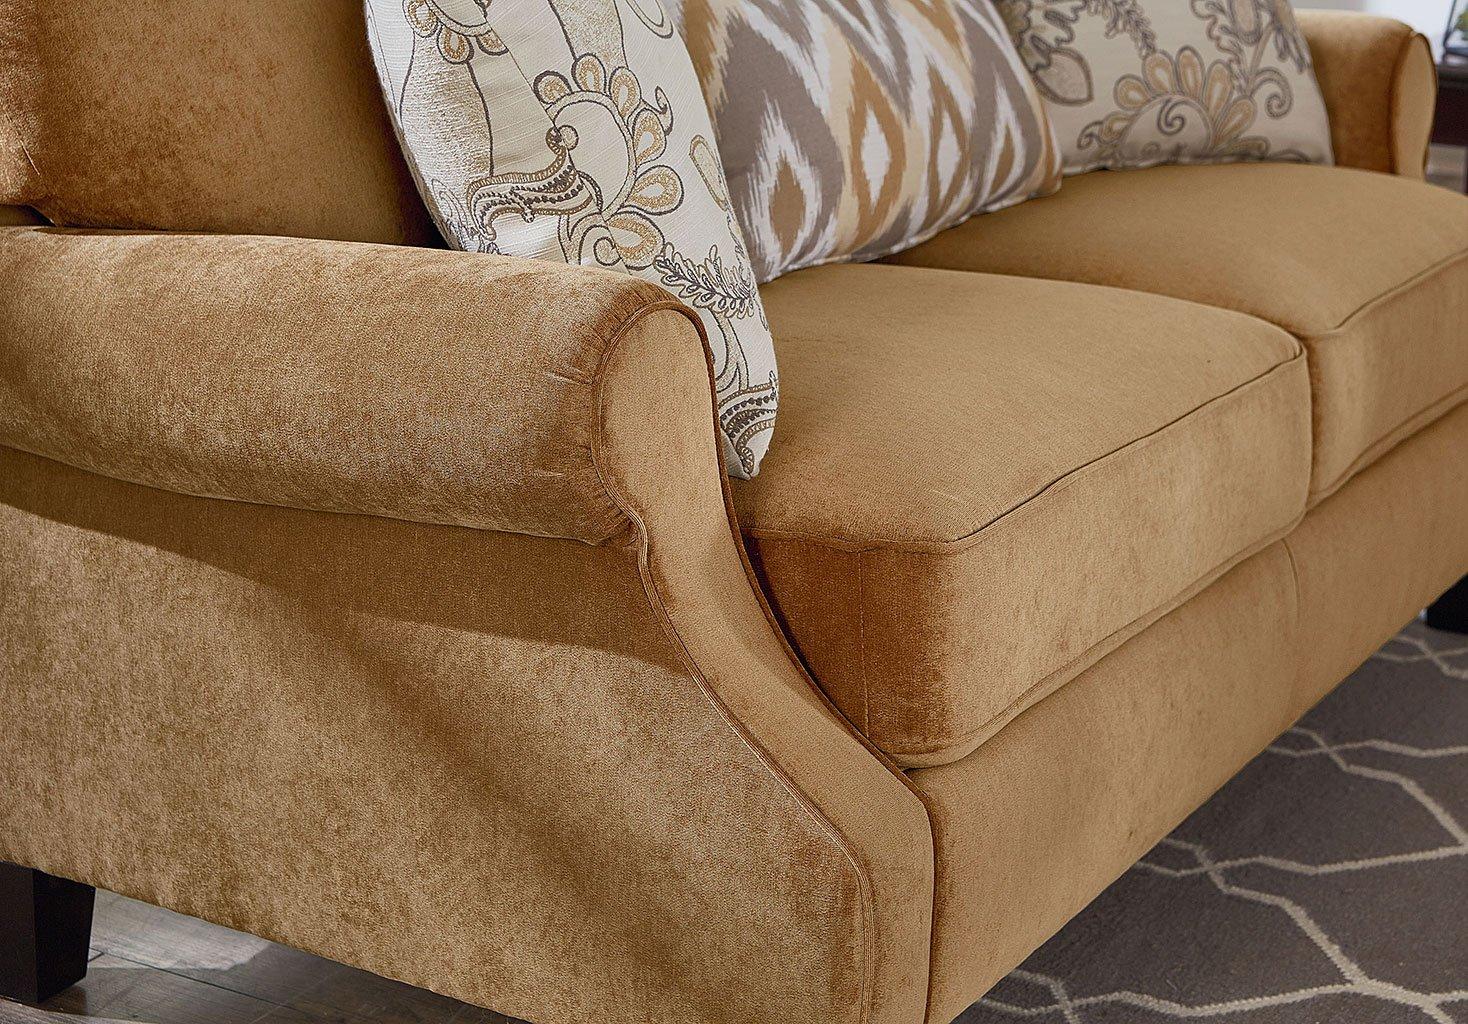 Terrific Waverly Loveseat Andrewgaddart Wooden Chair Designs For Living Room Andrewgaddartcom